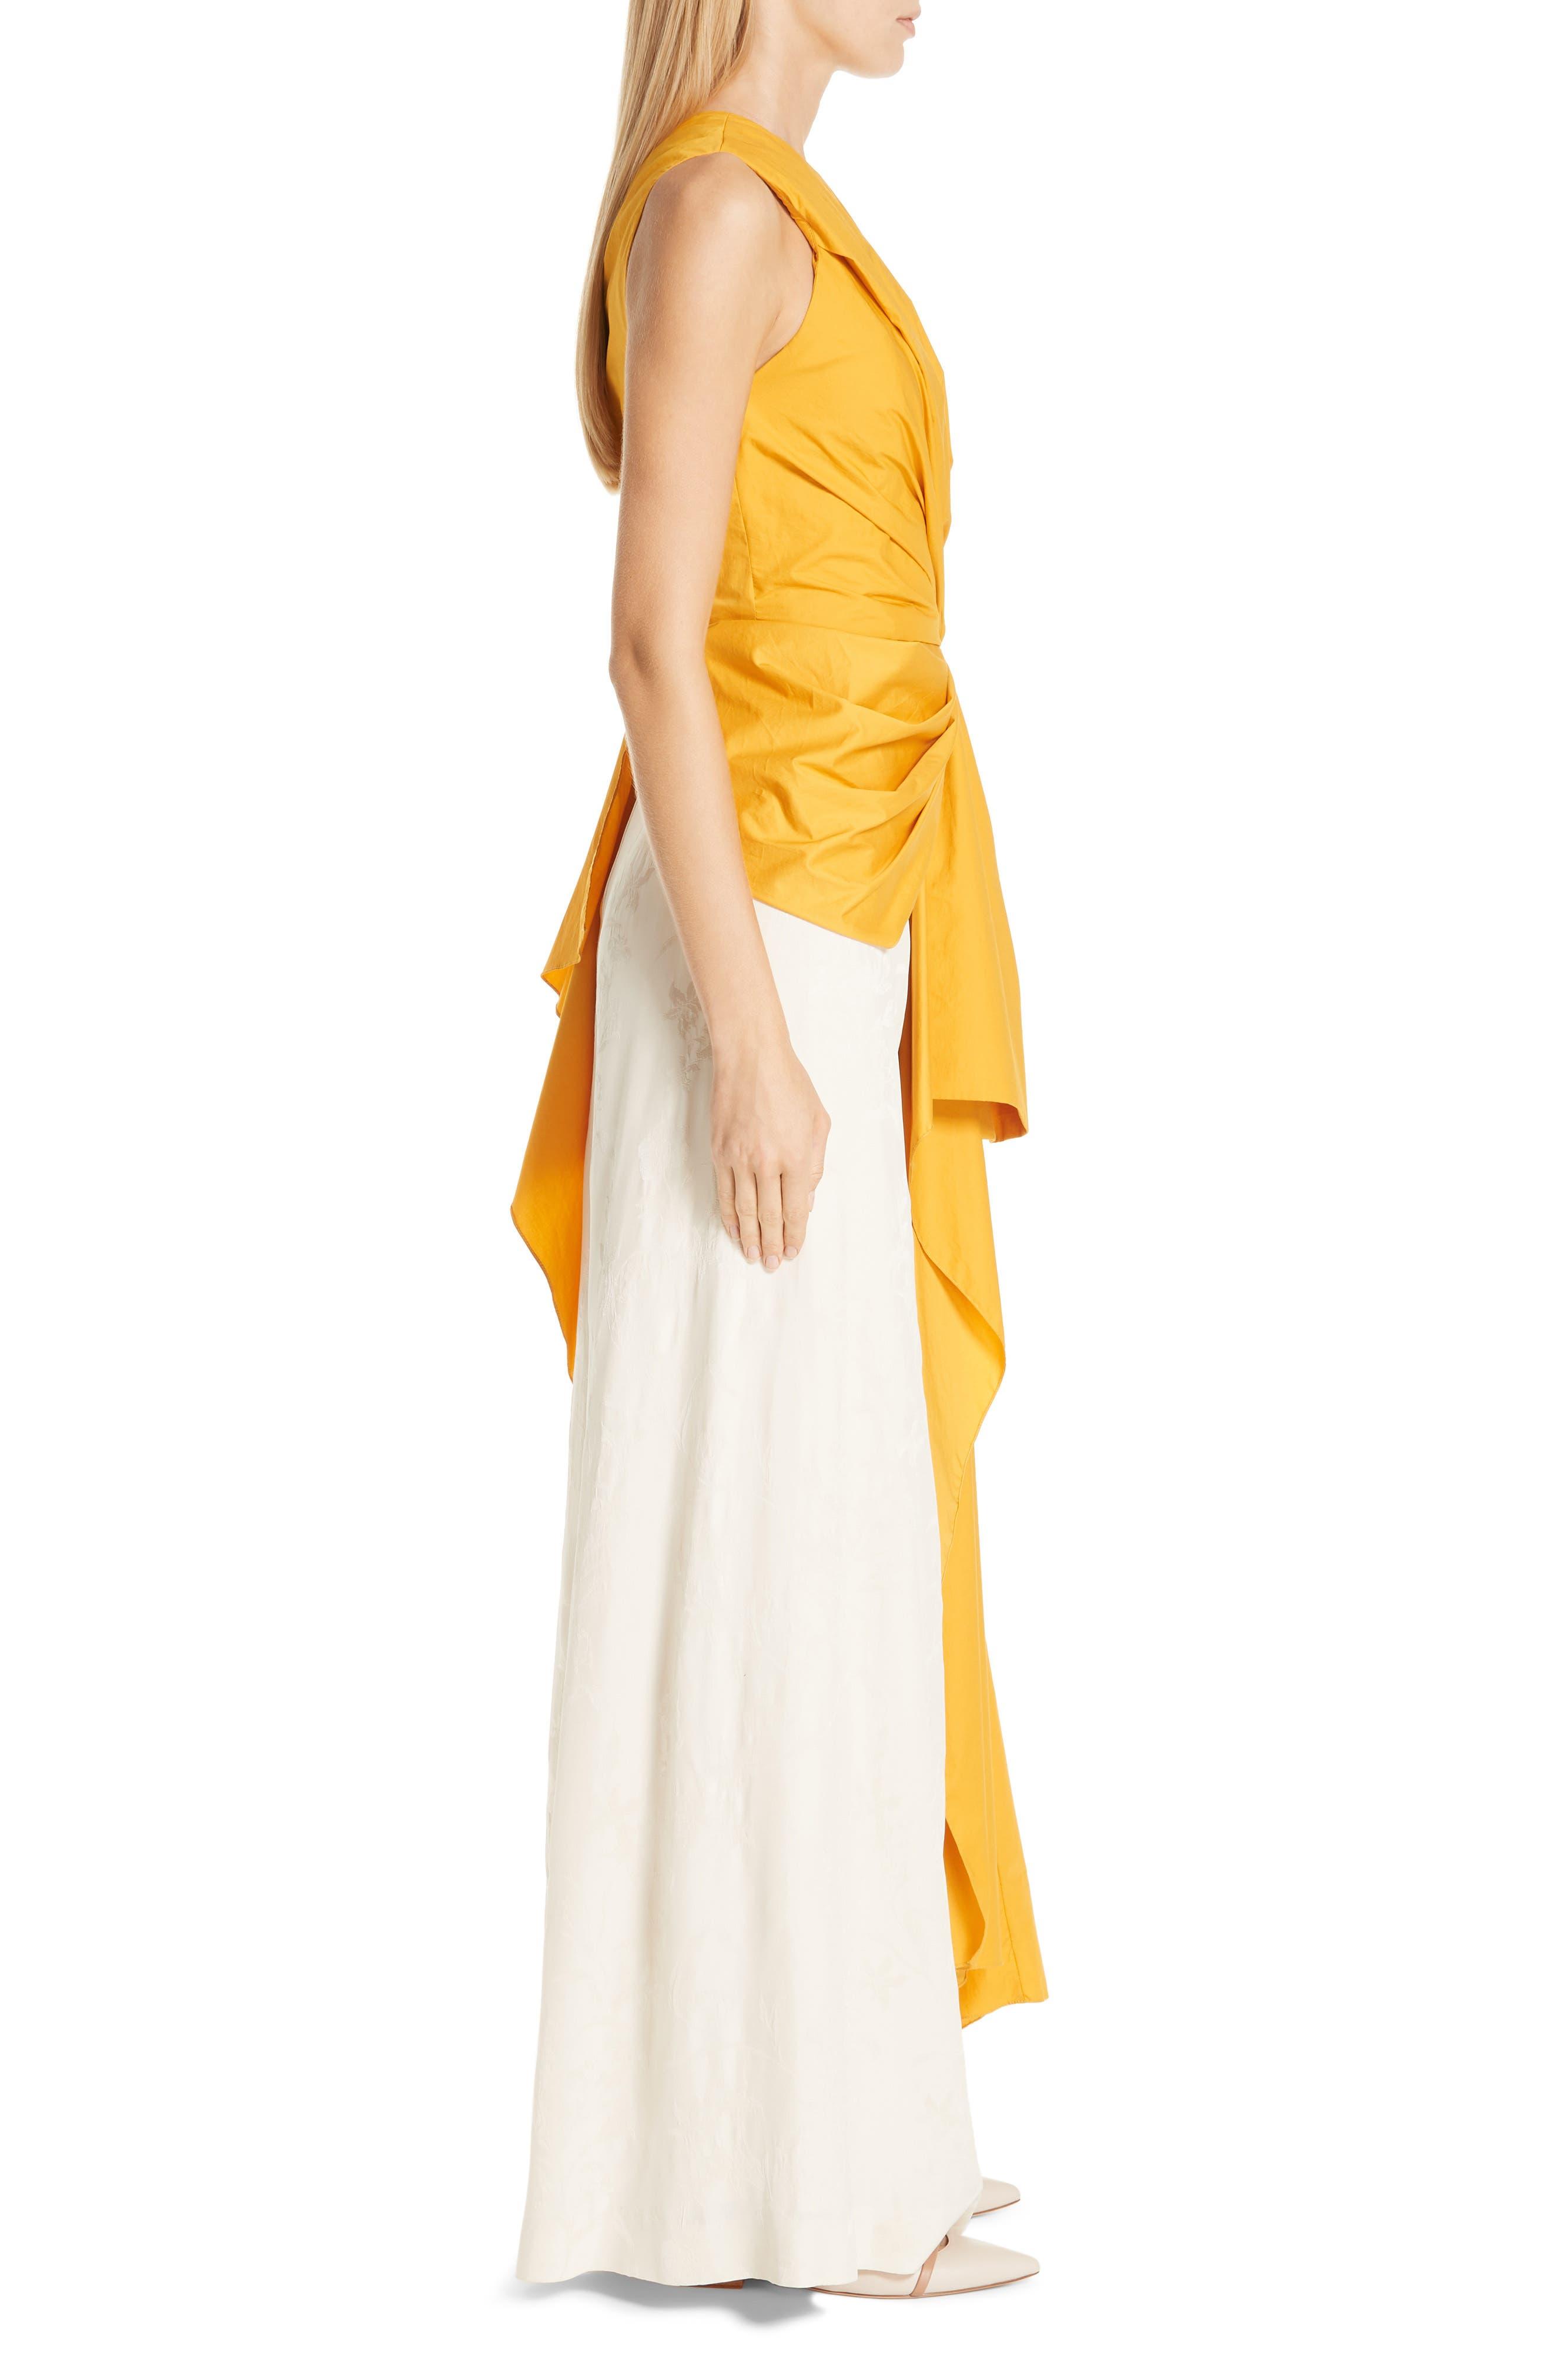 JOHANNA ORTIZ, One-Shoulder Asymmetrical Stretch Poplin Top, Alternate thumbnail 3, color, DANDELION